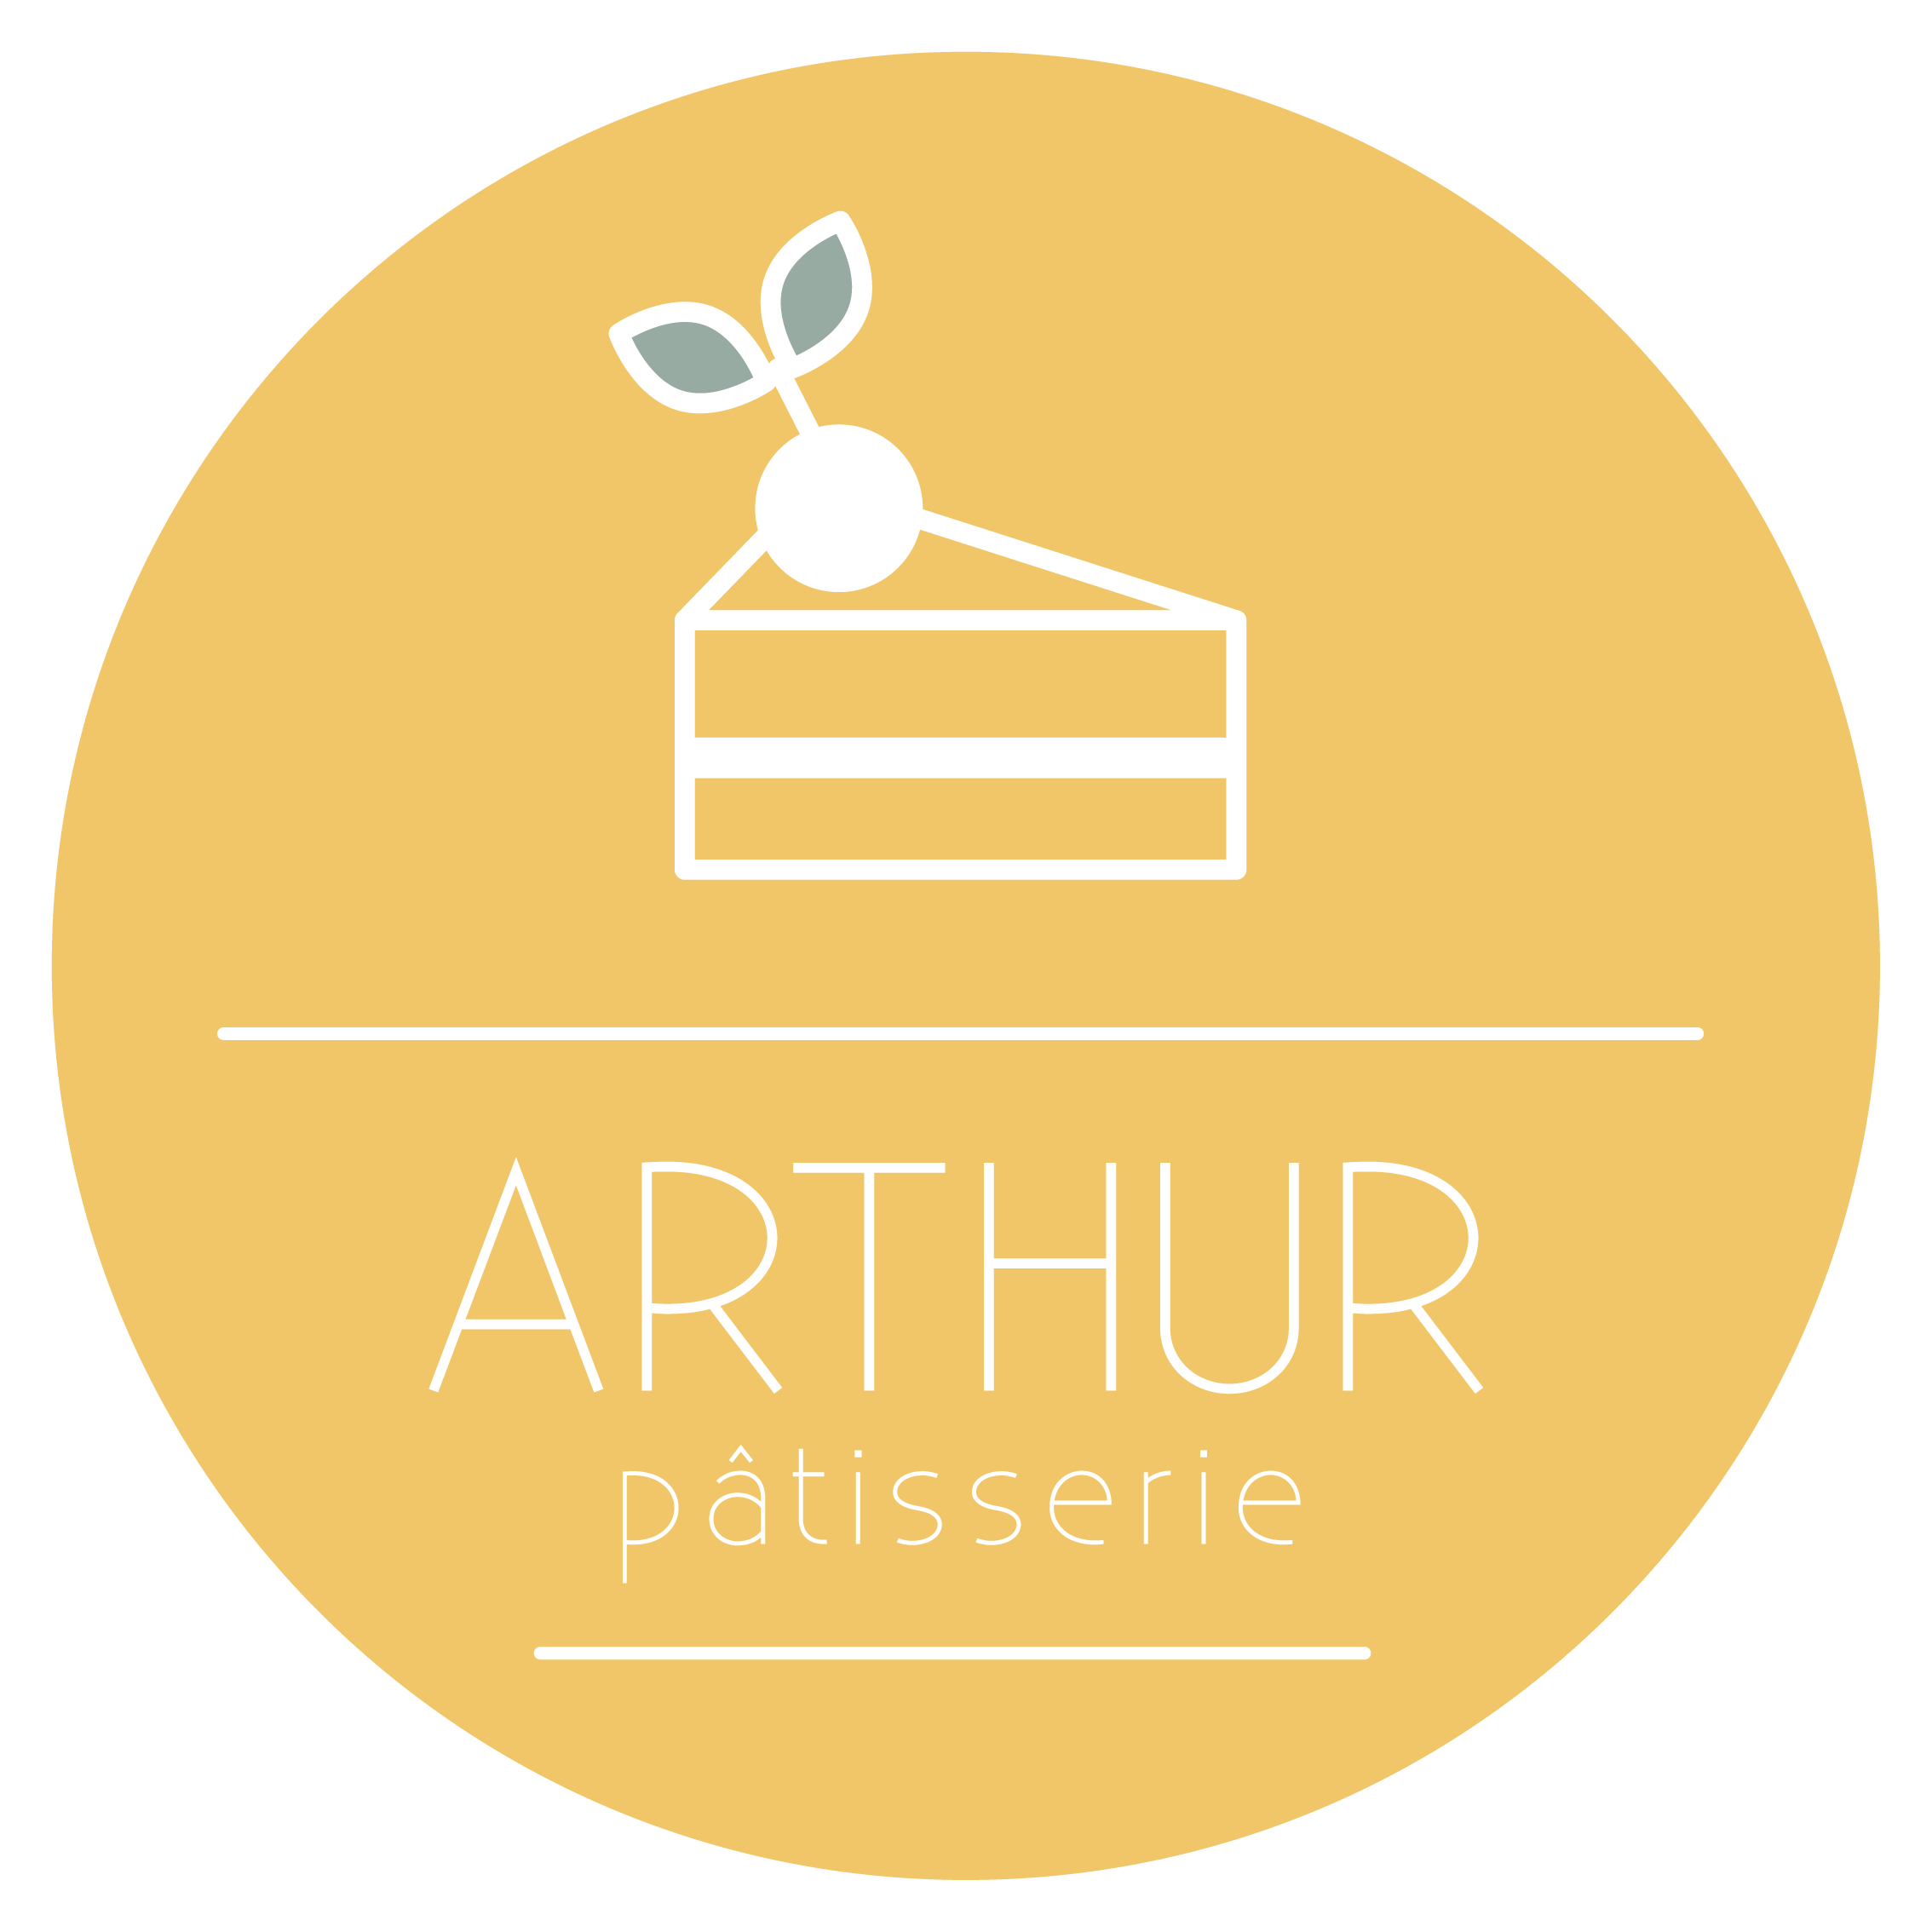 Logo Arthur pâtisserie